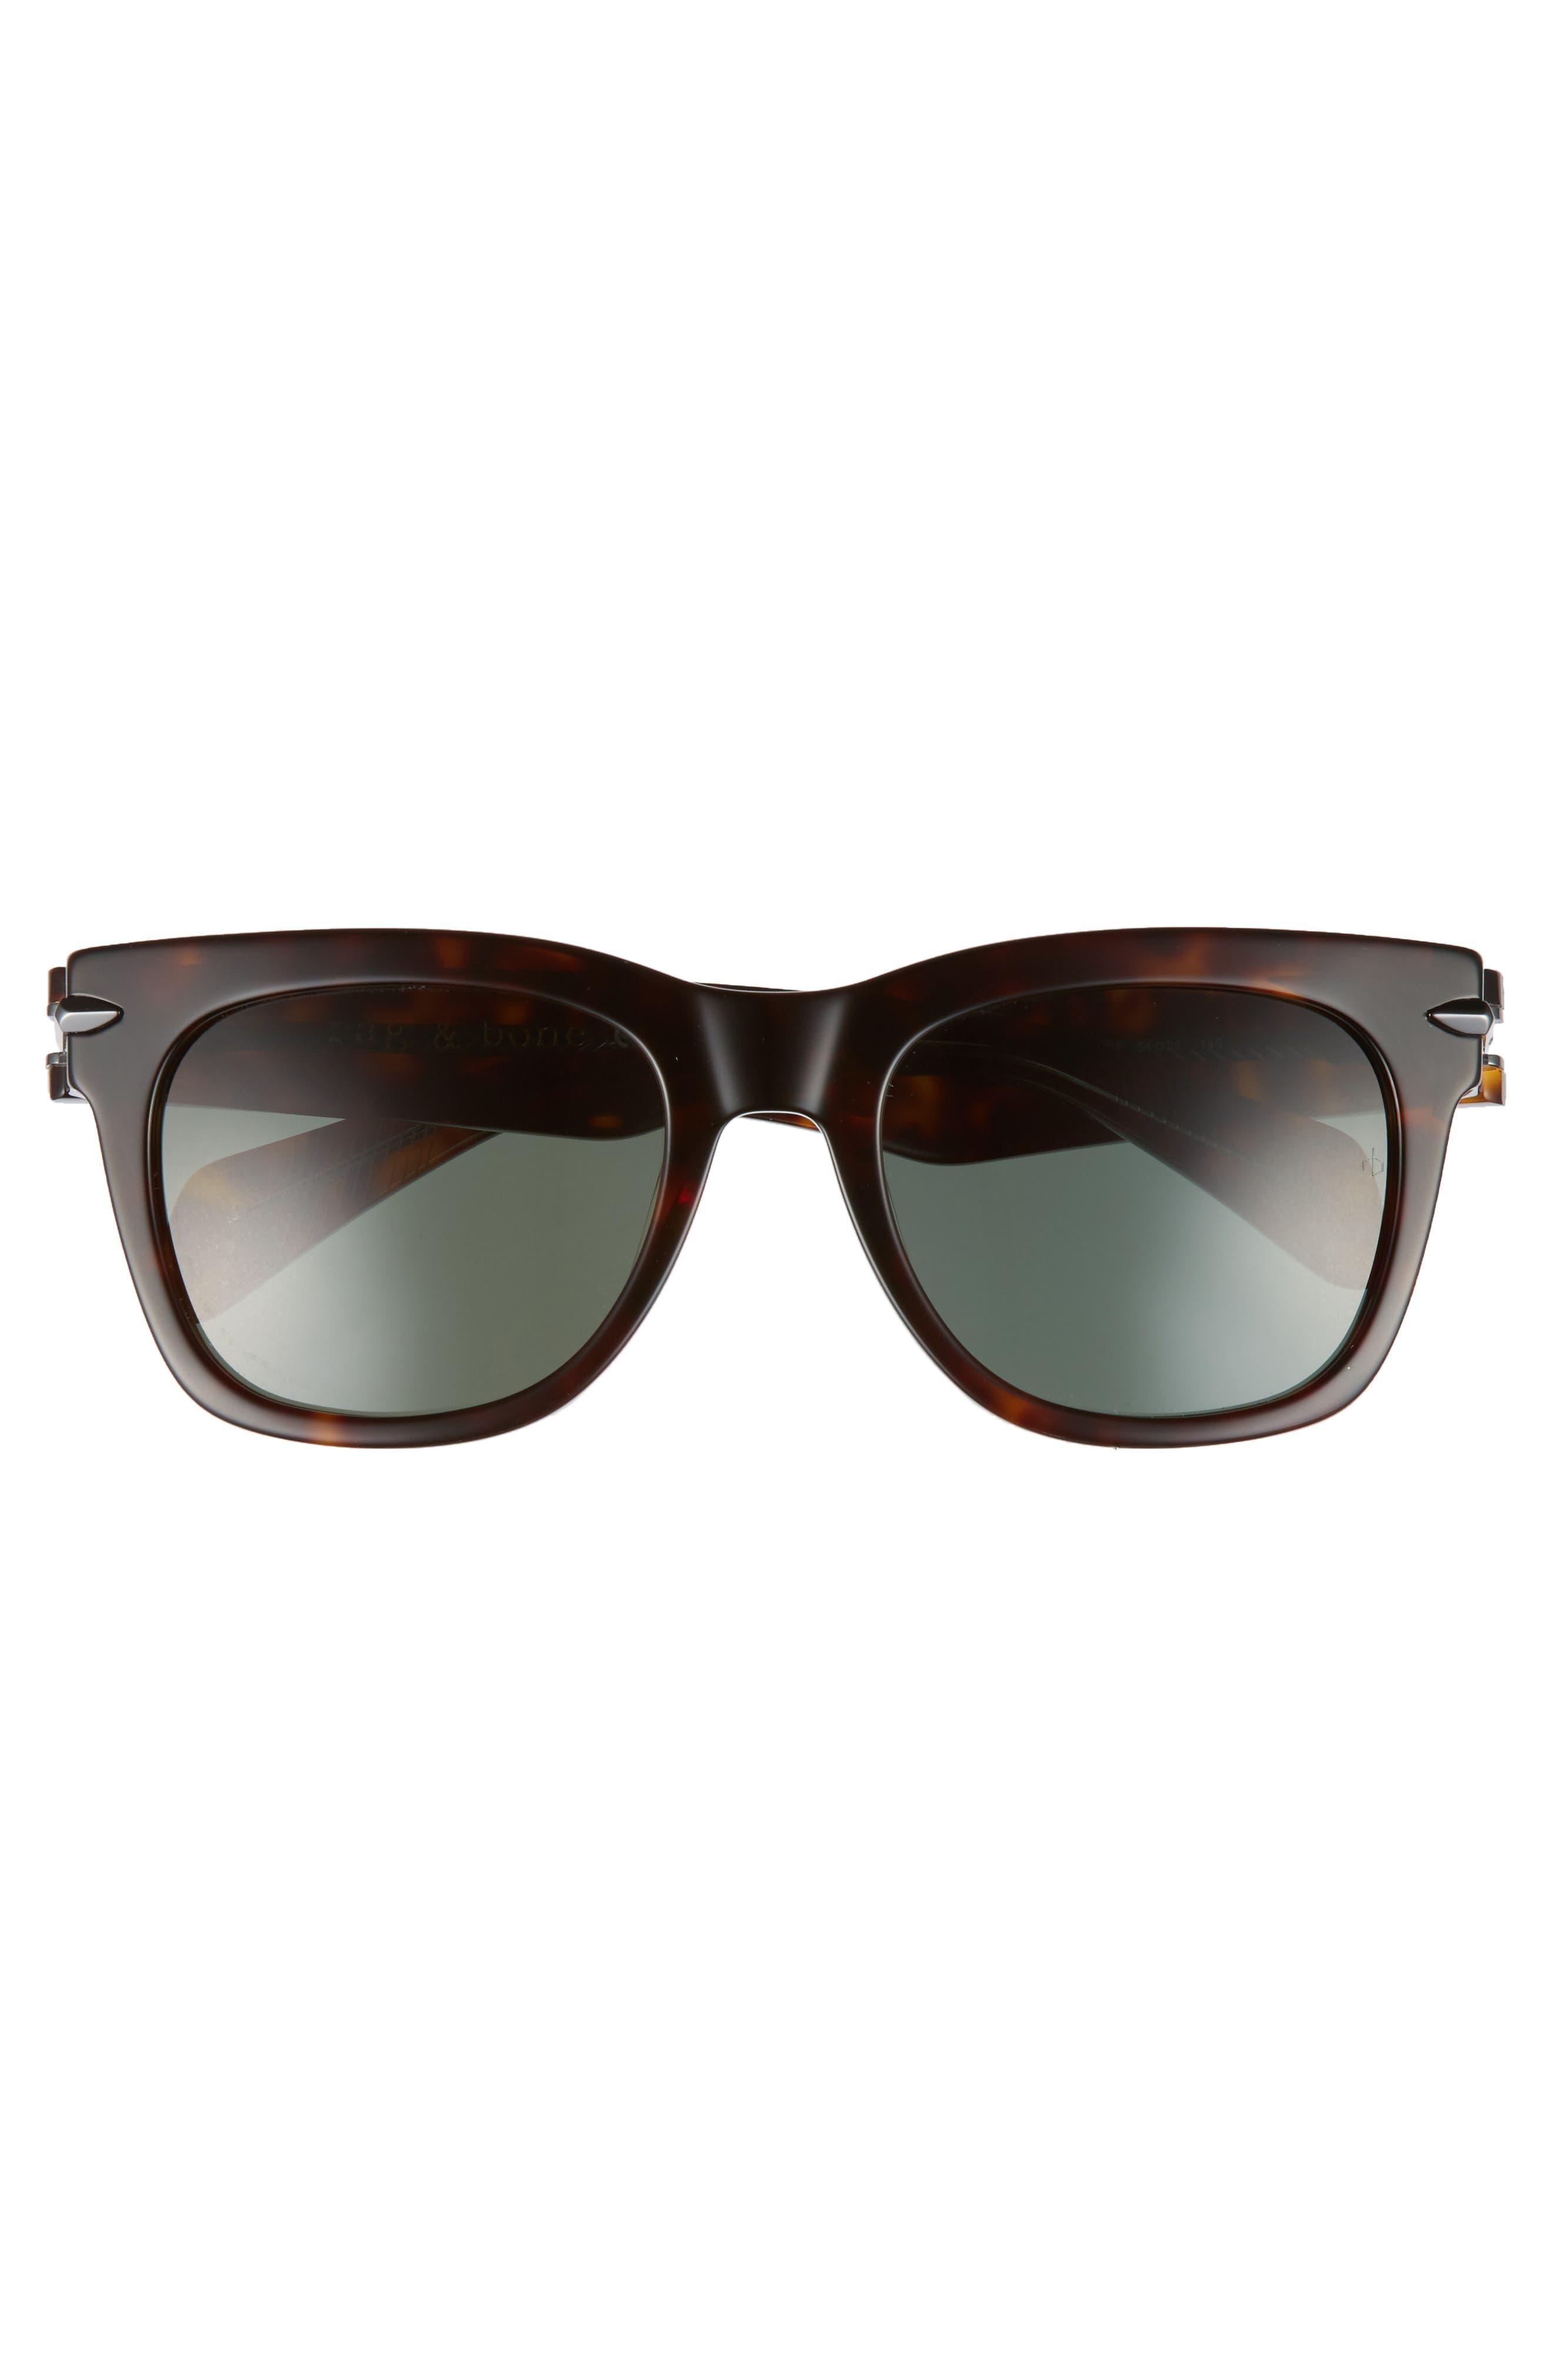 54mm Sunglasses,                             Alternate thumbnail 2, color,                             DARK HAVANA